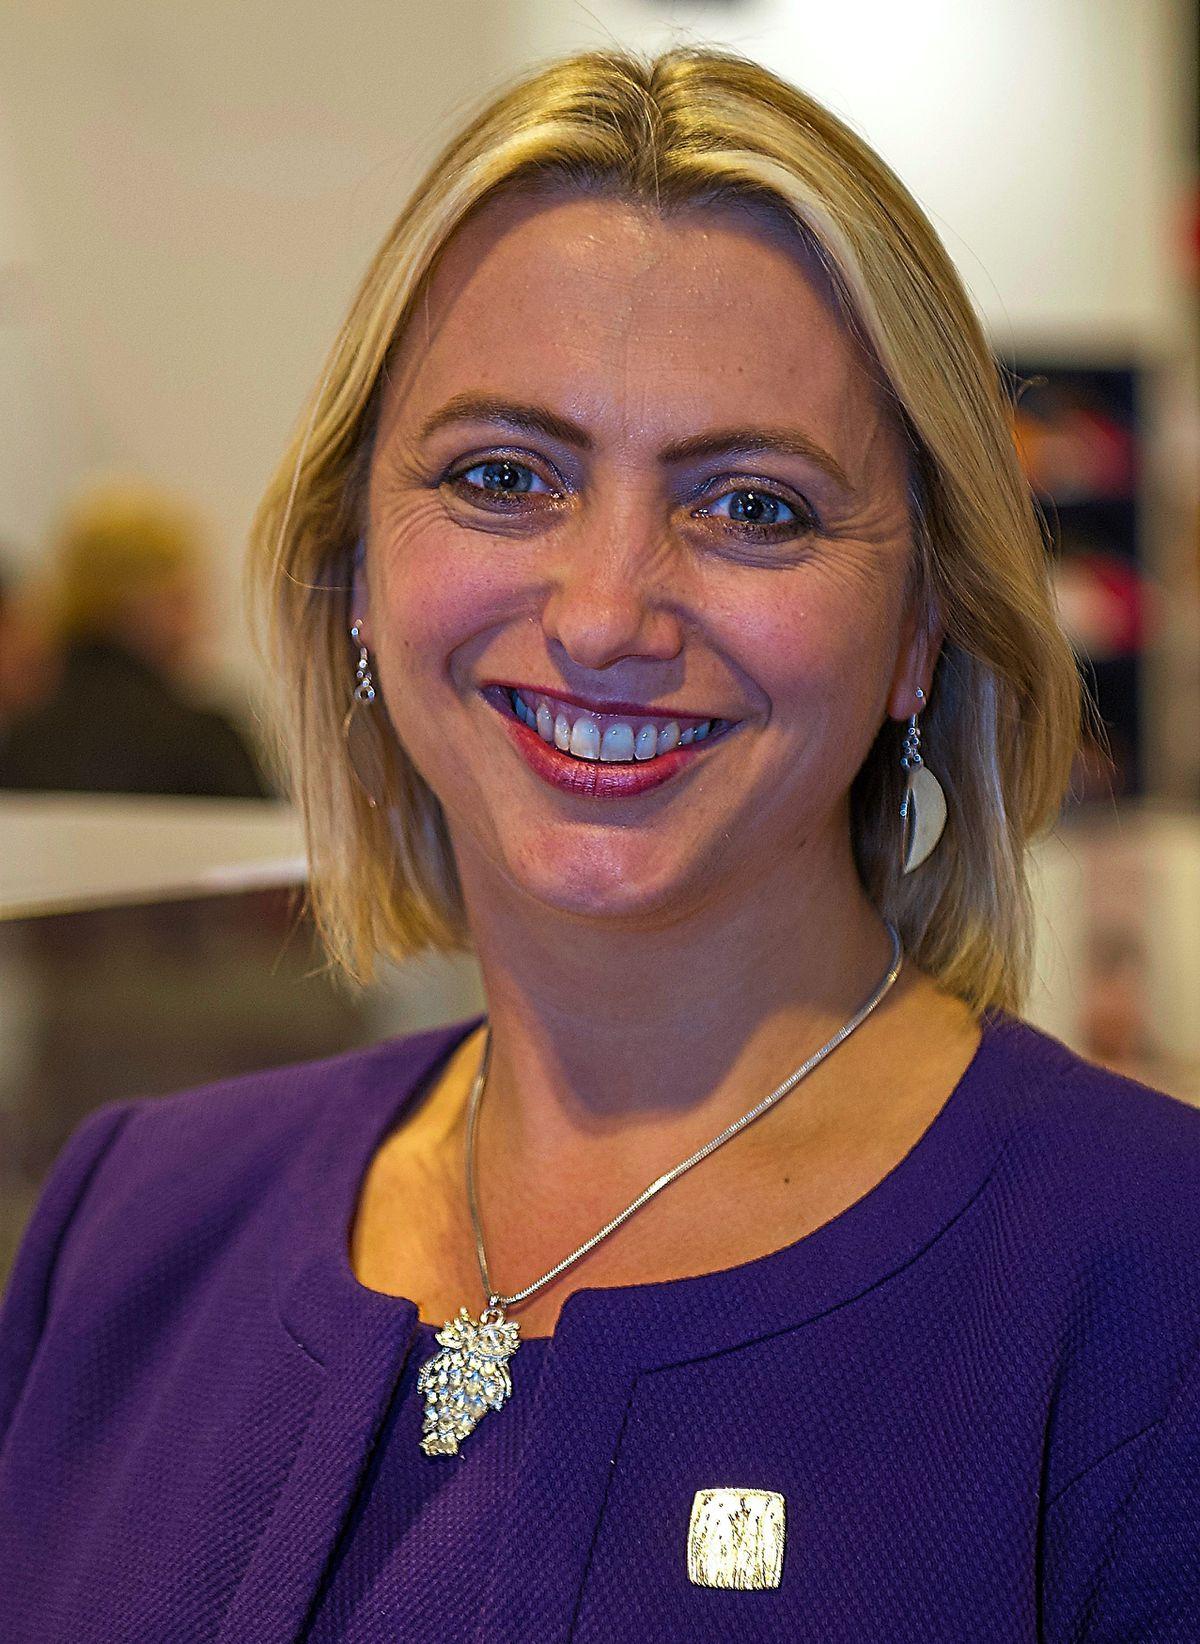 Dr Helen Stokes-Lampard